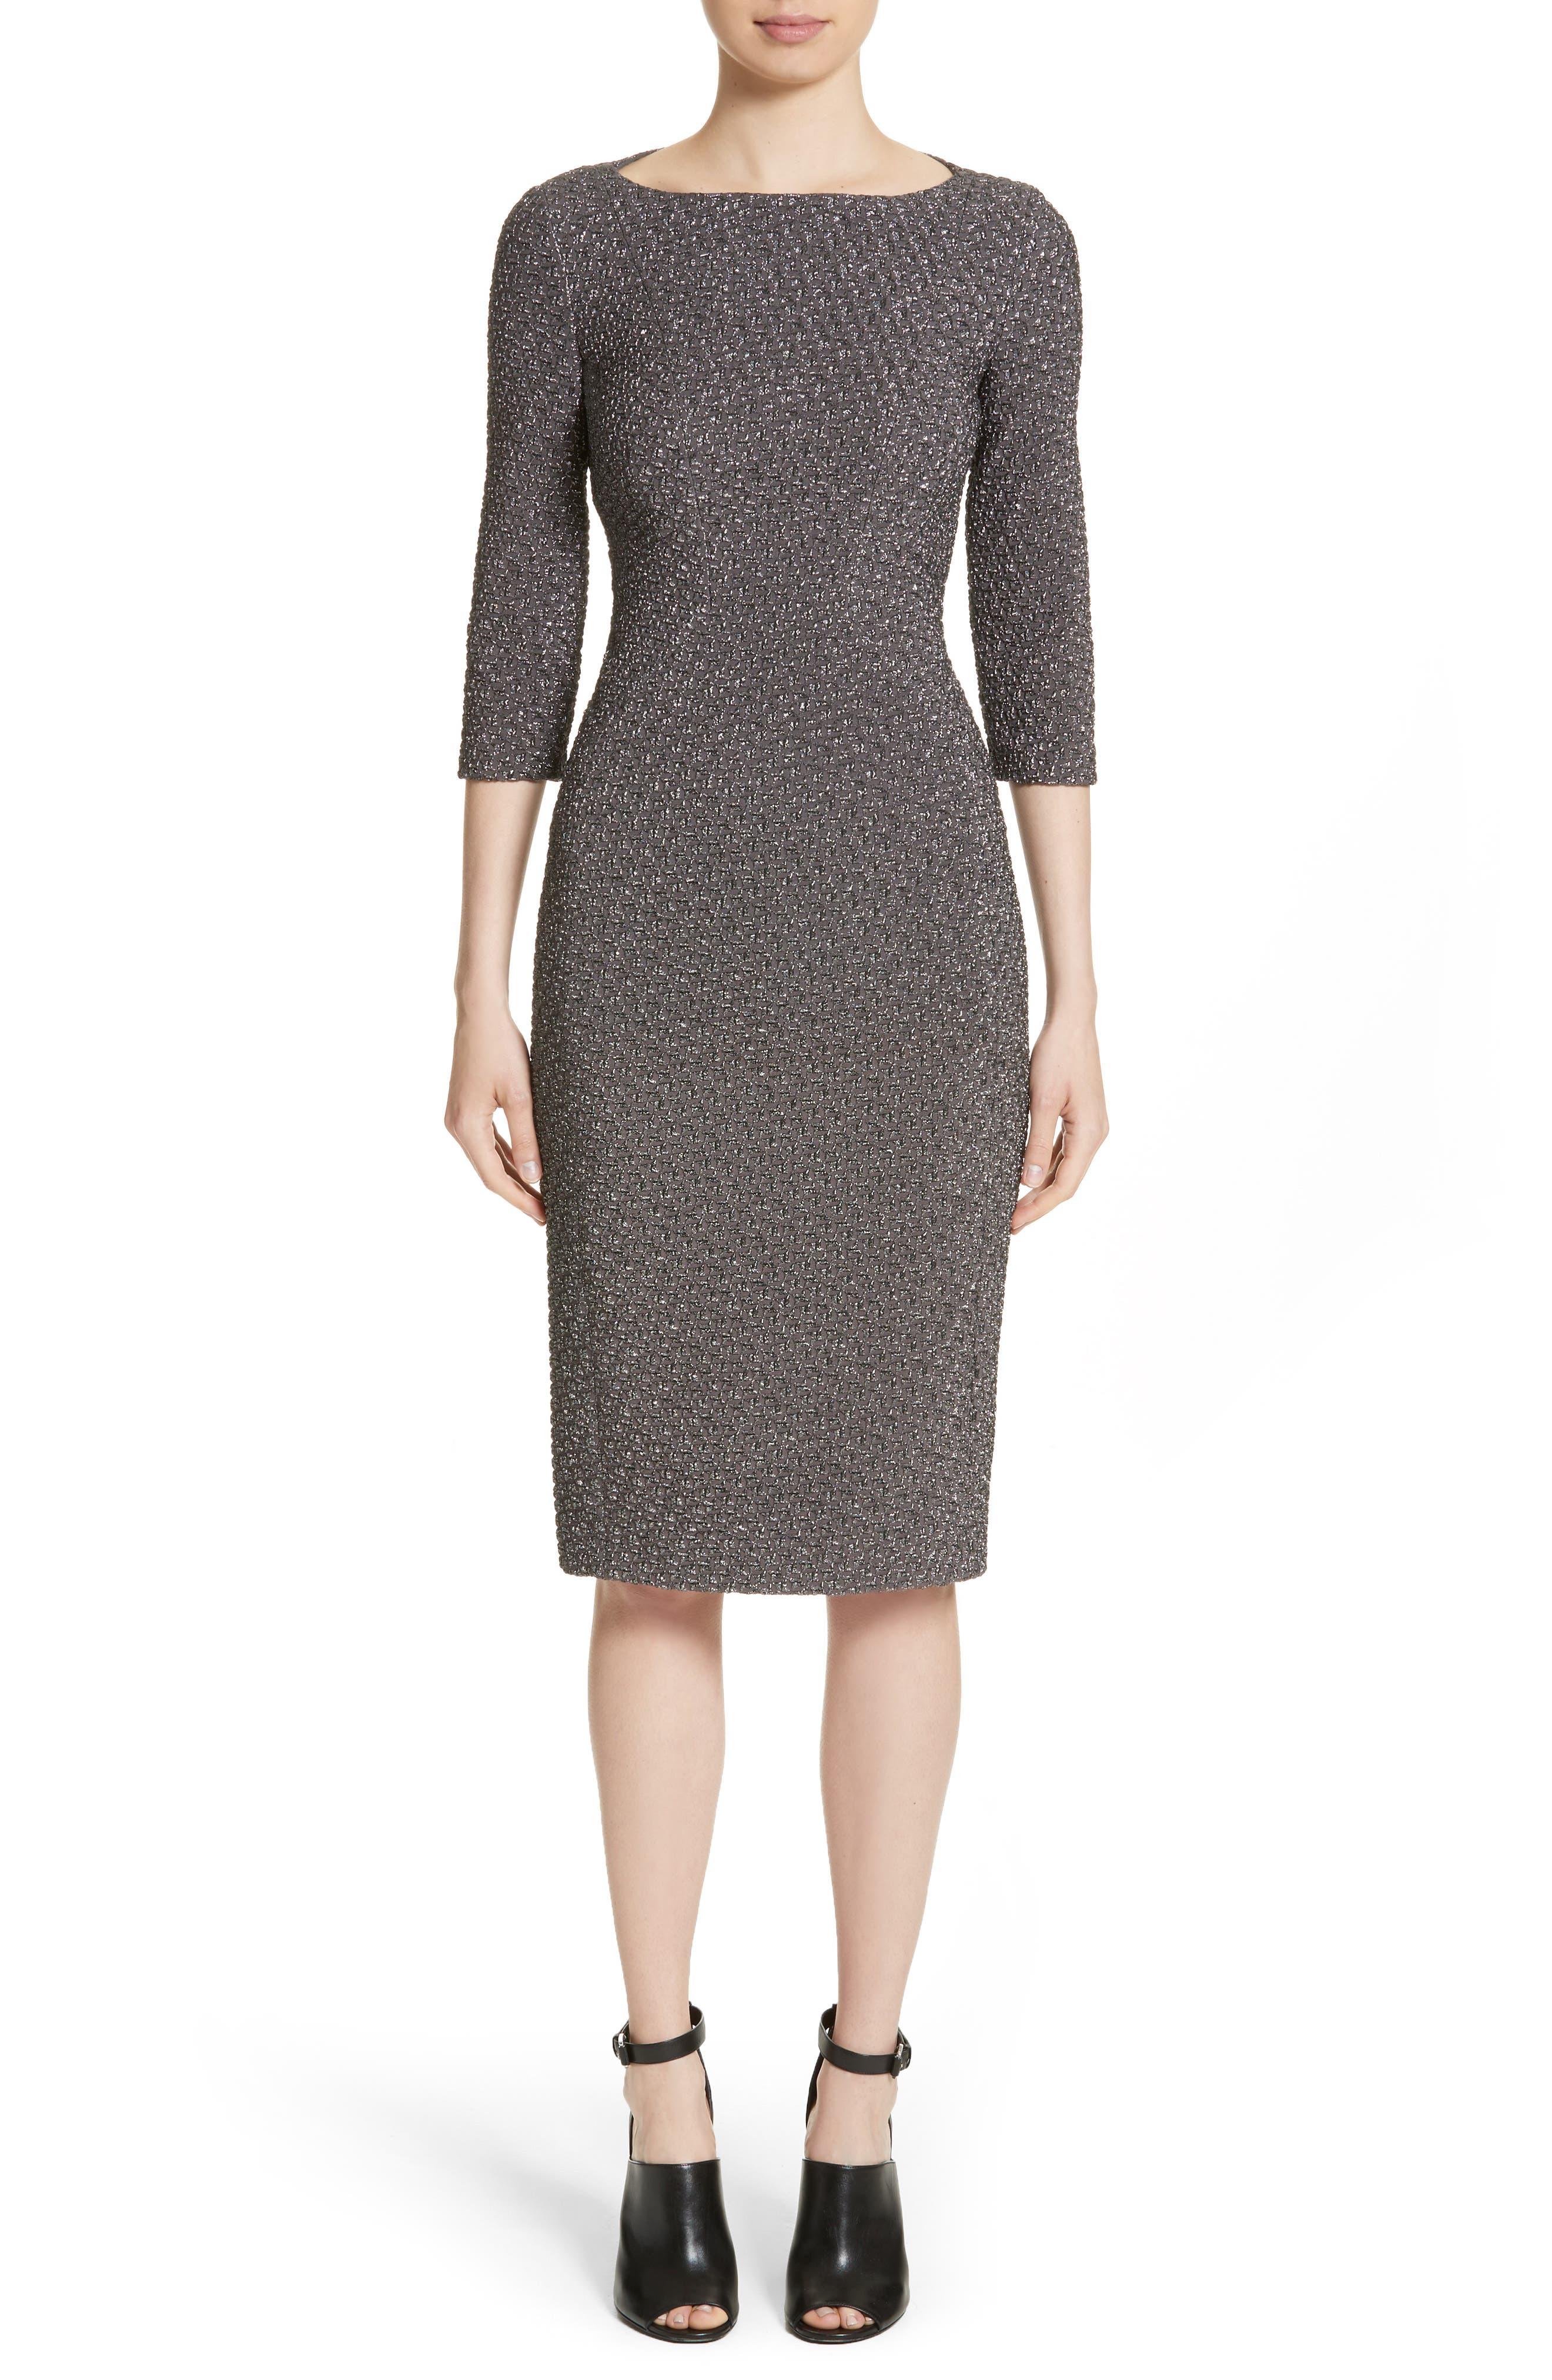 Houndstooth Stretch Metallic Jacquard Sheath Dress,                         Main,                         color, 029